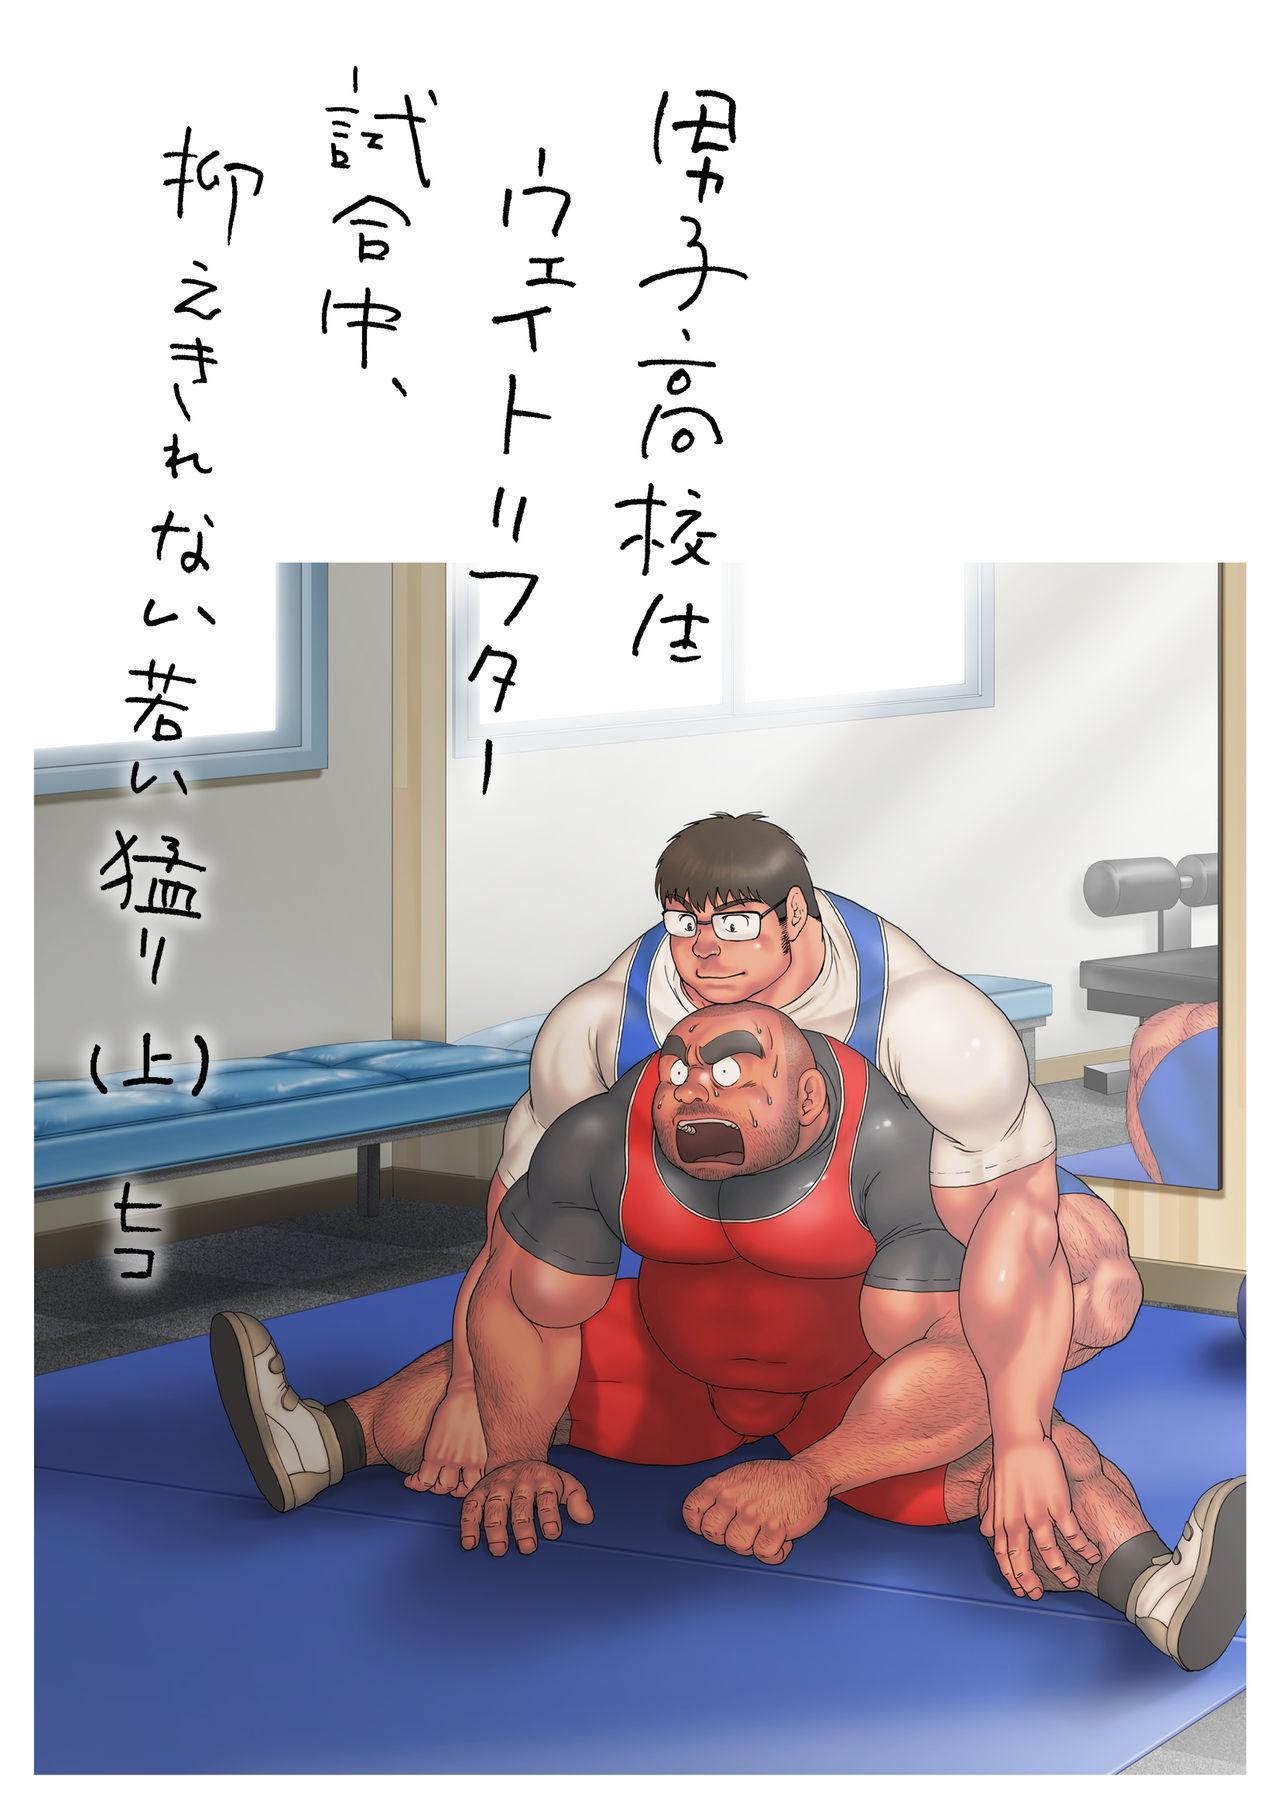 Danshi Koukousei Weightlifter Shiai-chuu, Osae kirenai Wakai Takeri 2